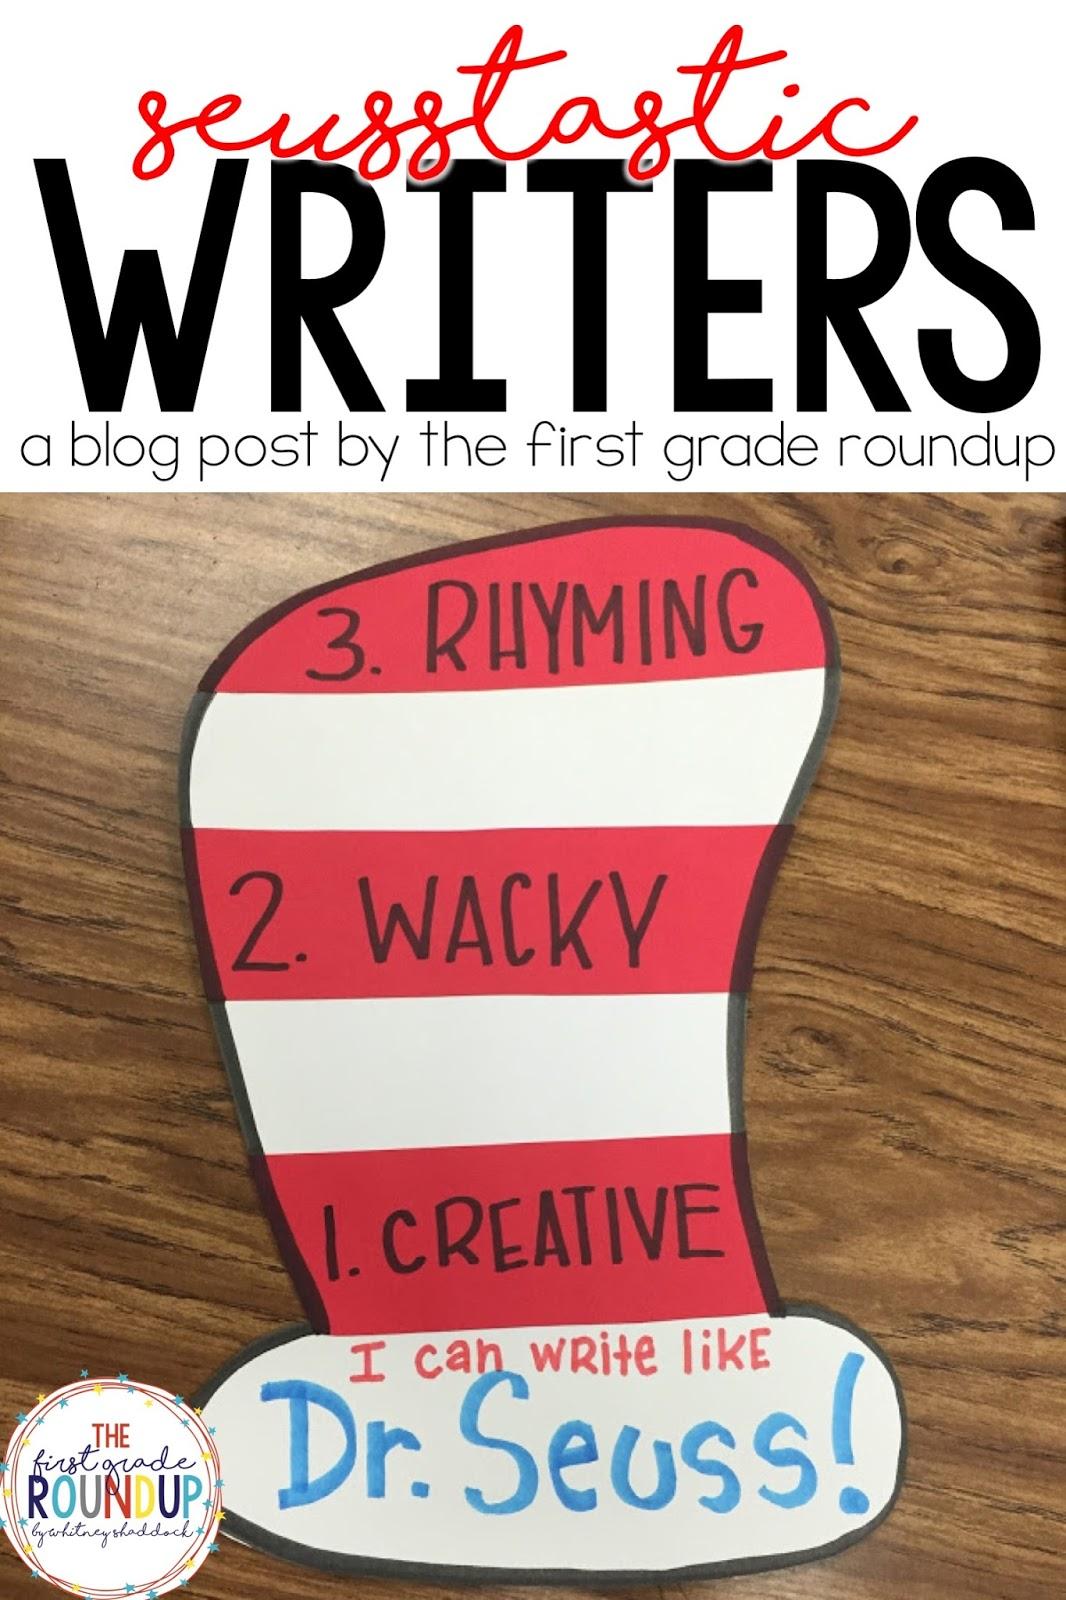 Write Like Dr. Seuss! - Firstgraderoundup